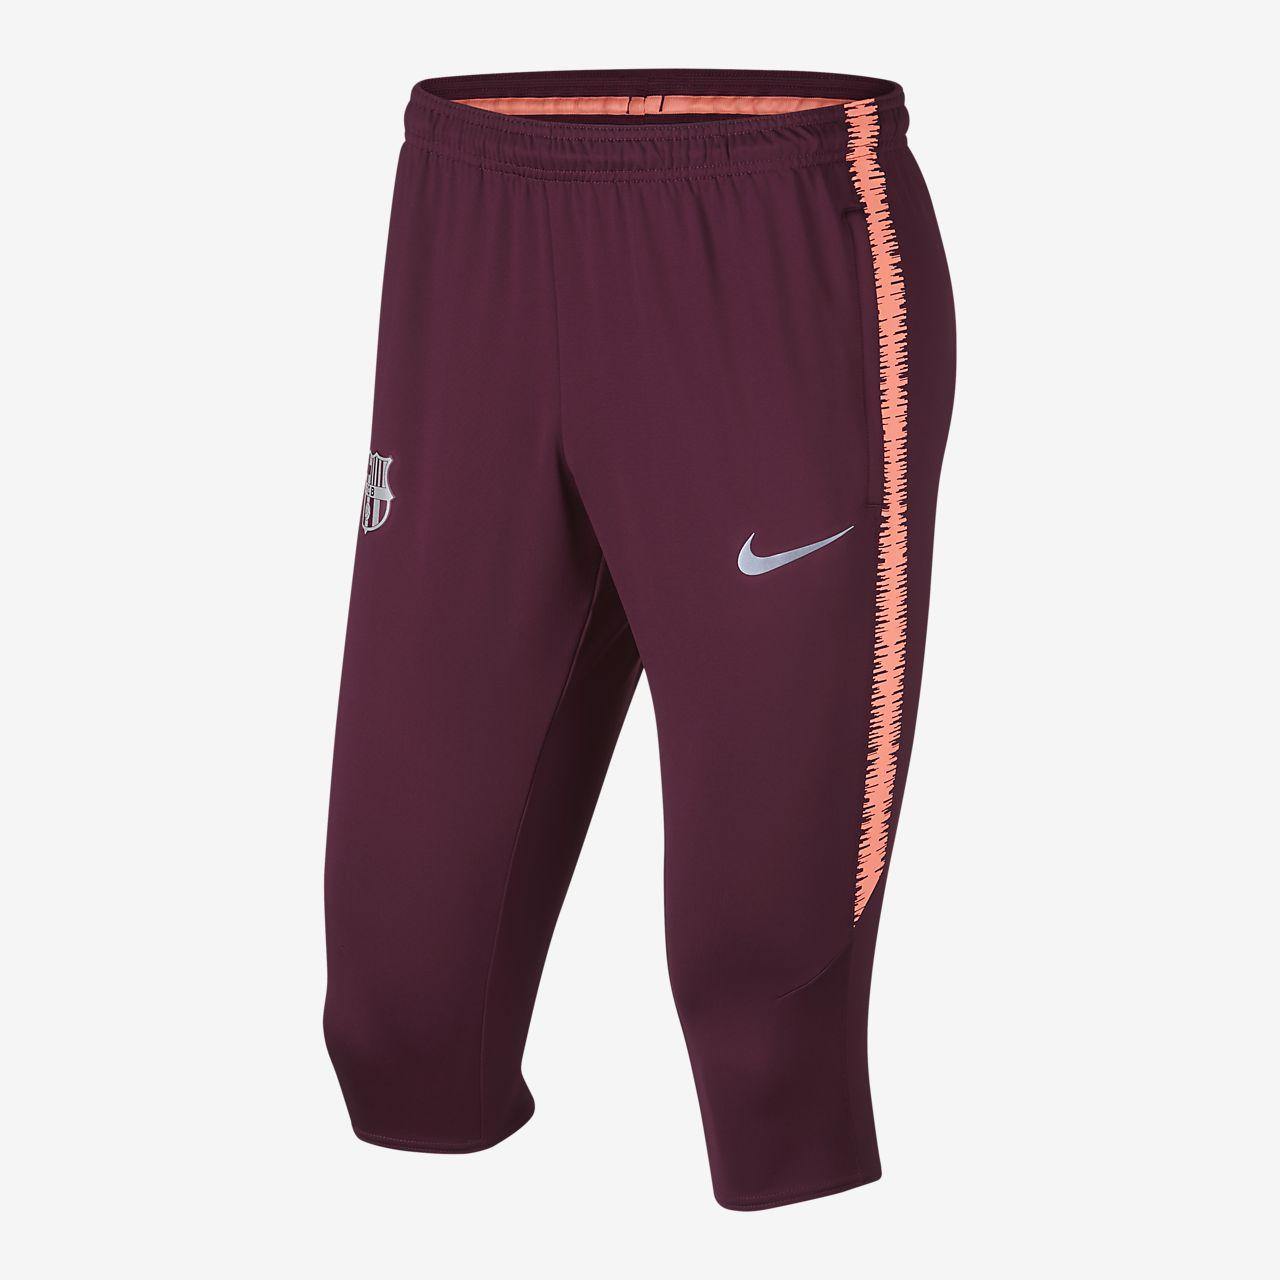 66617db65226 FC Barcelona Dri-FIT Squad Men s 3 4 Football Pants. Nike.com GB